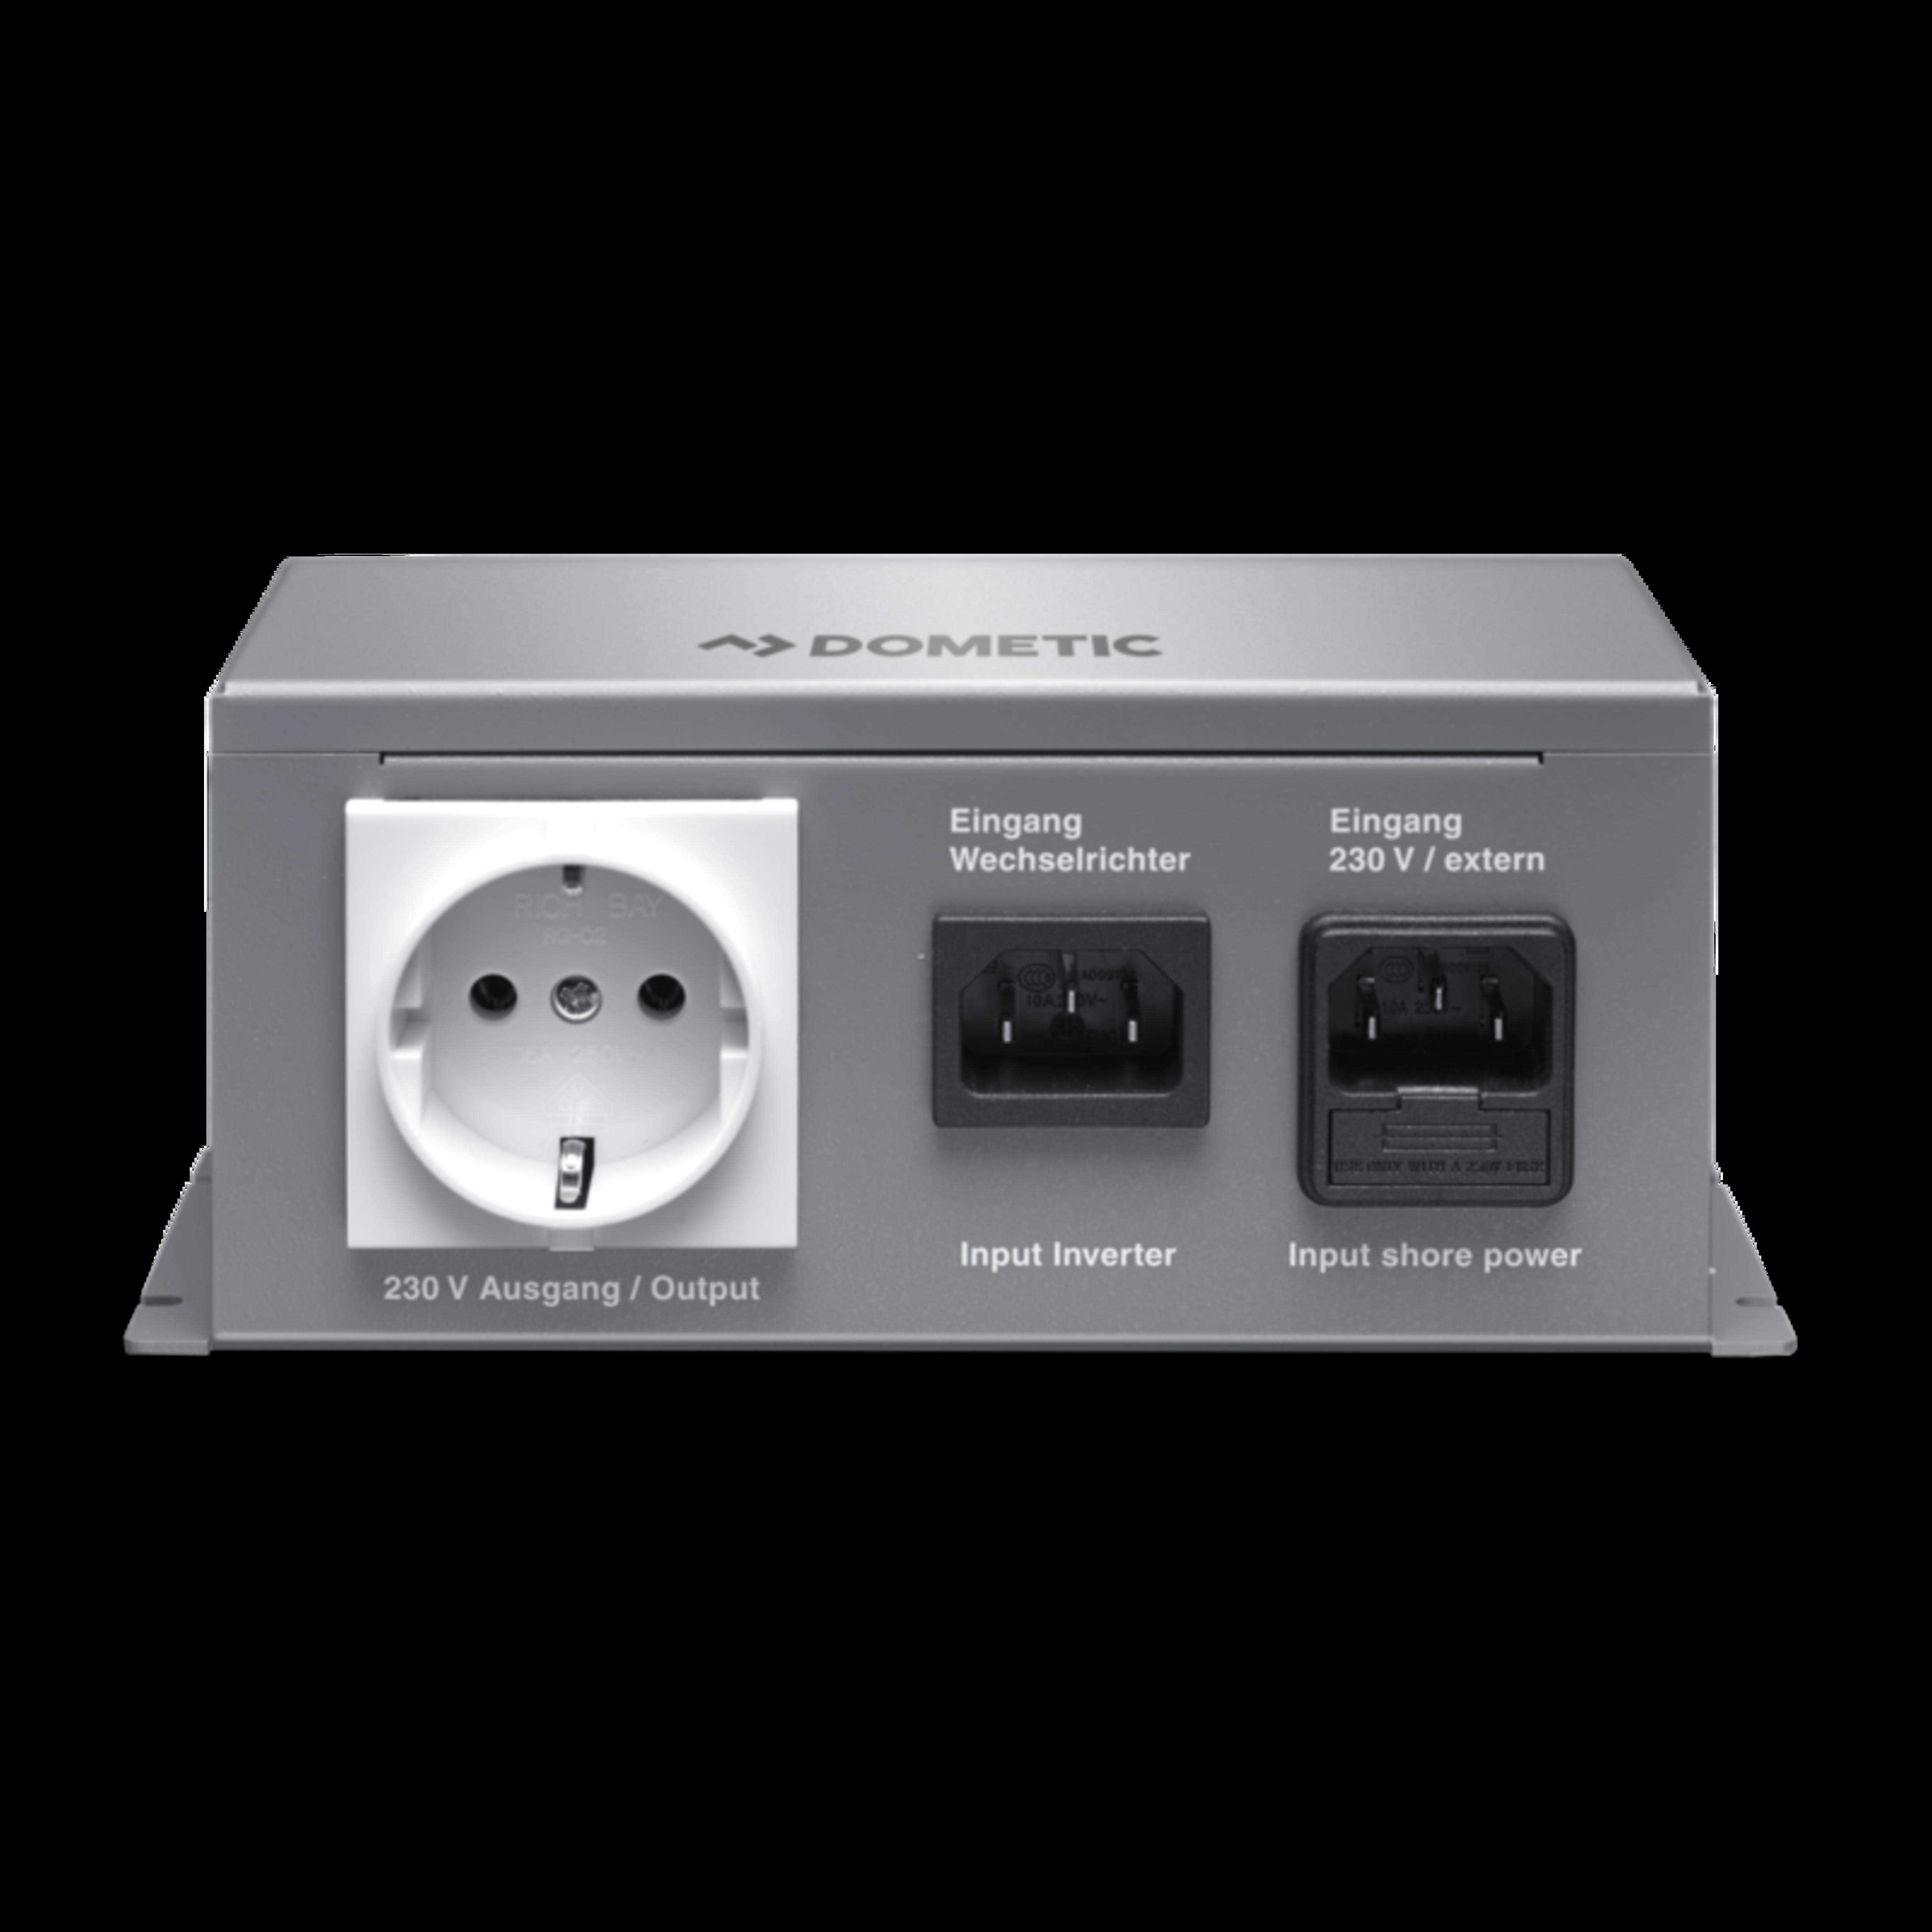 Dometic SinePower VS 230